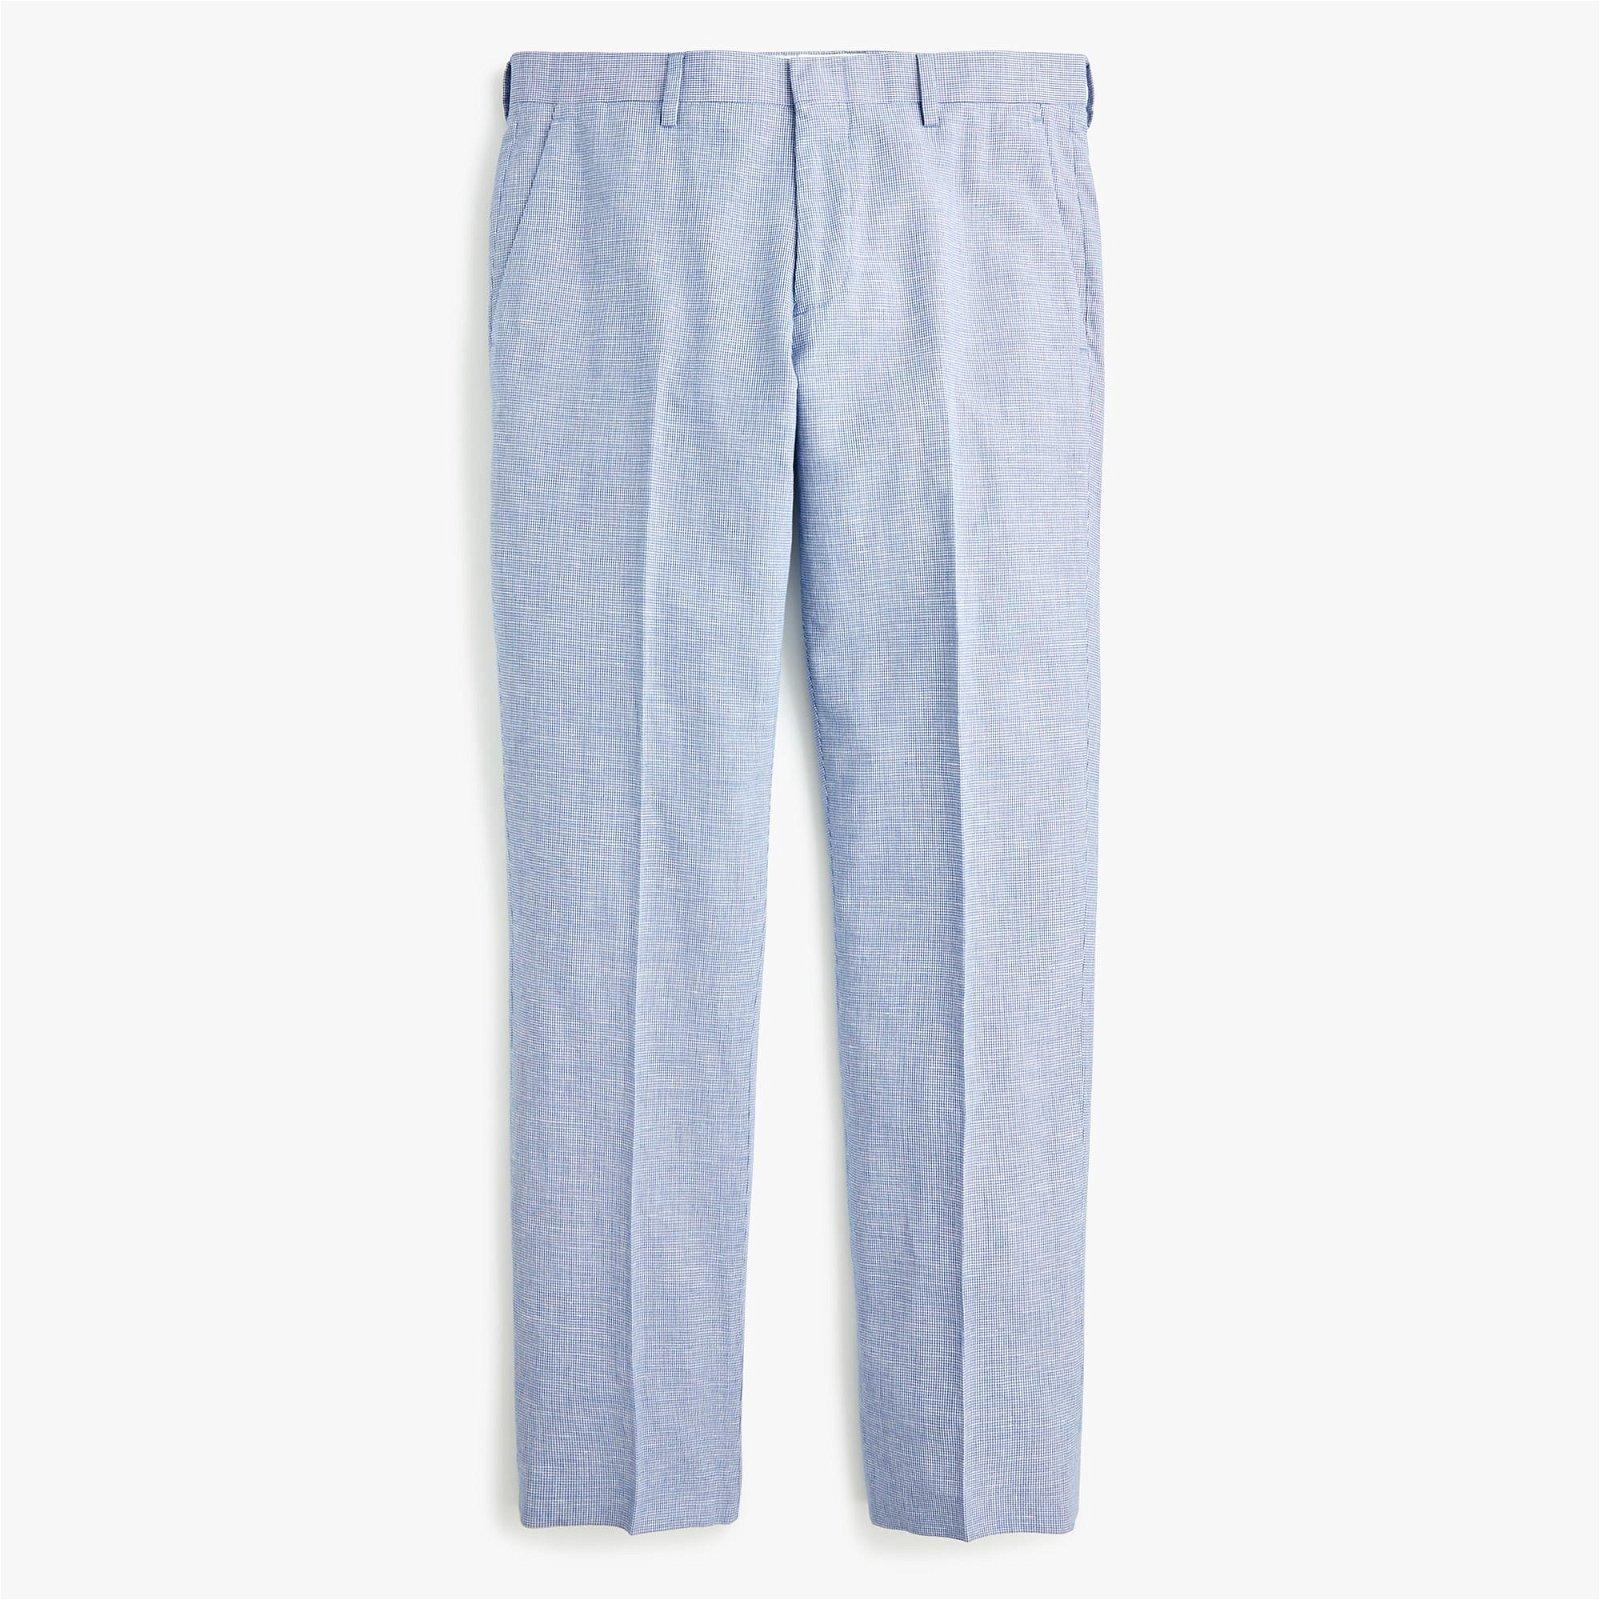 Ludlow Slim-fit unstructured suit pant in cotton-linen